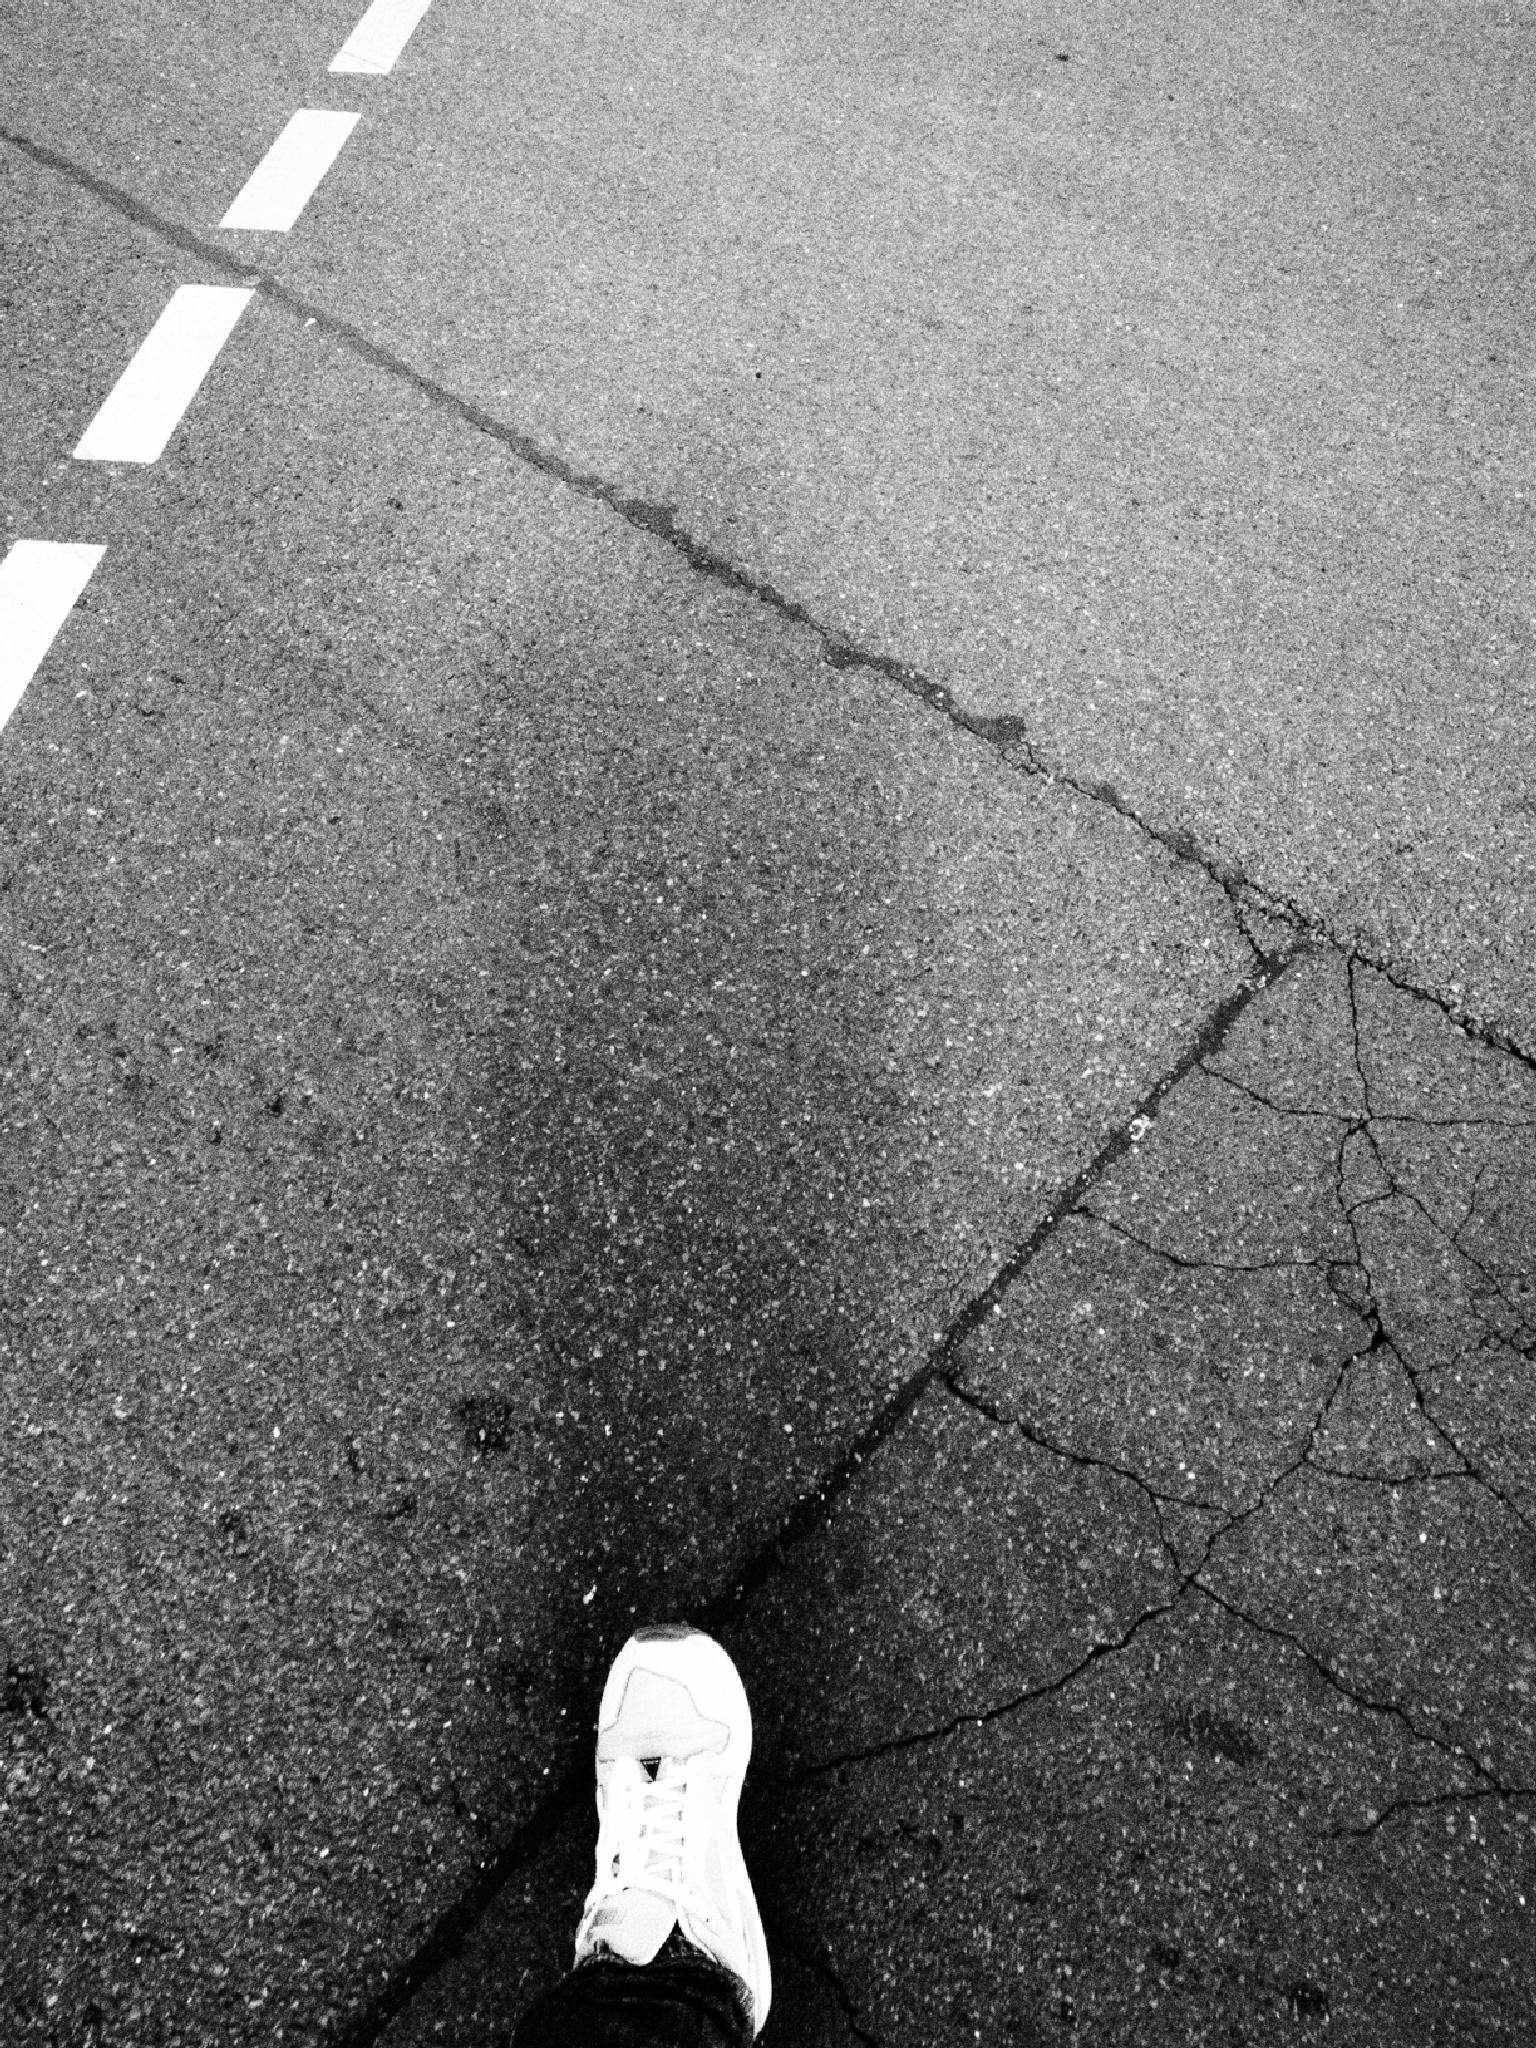 on the run by Cit Pelo